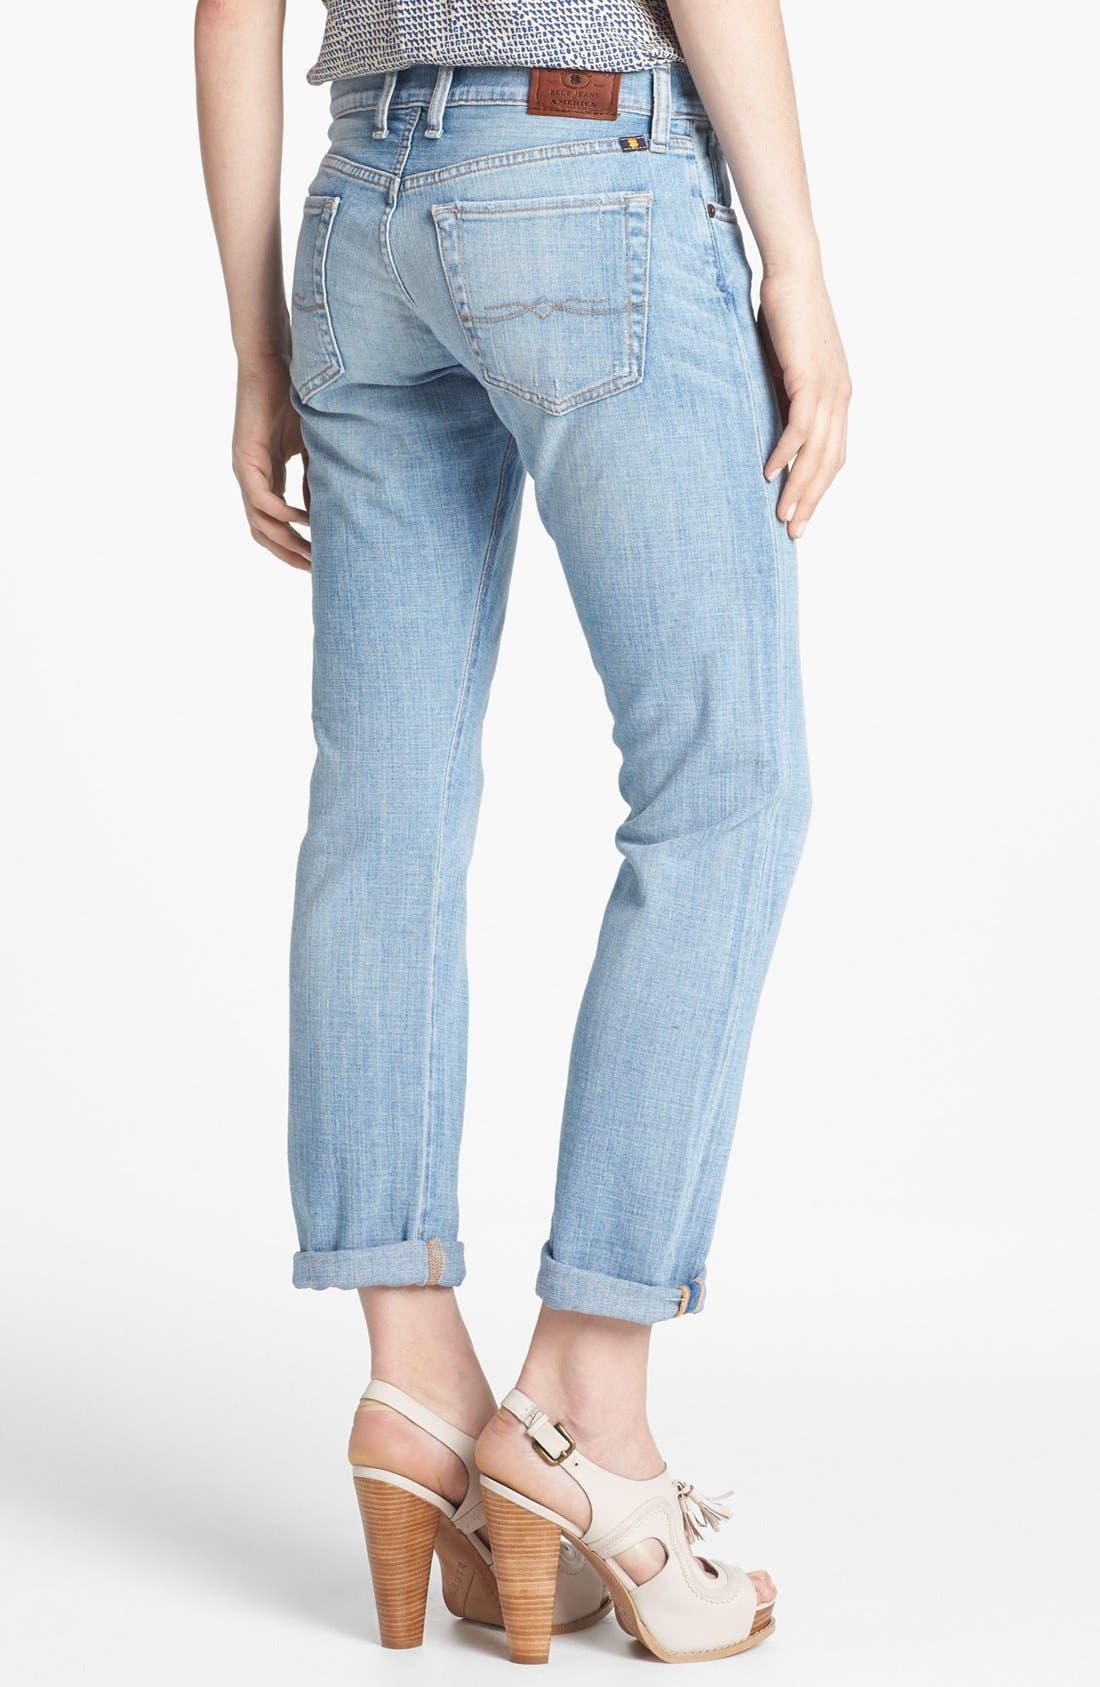 'Sienna' Tomboy Crop Jeans,                             Alternate thumbnail 2, color,                             La Jolla